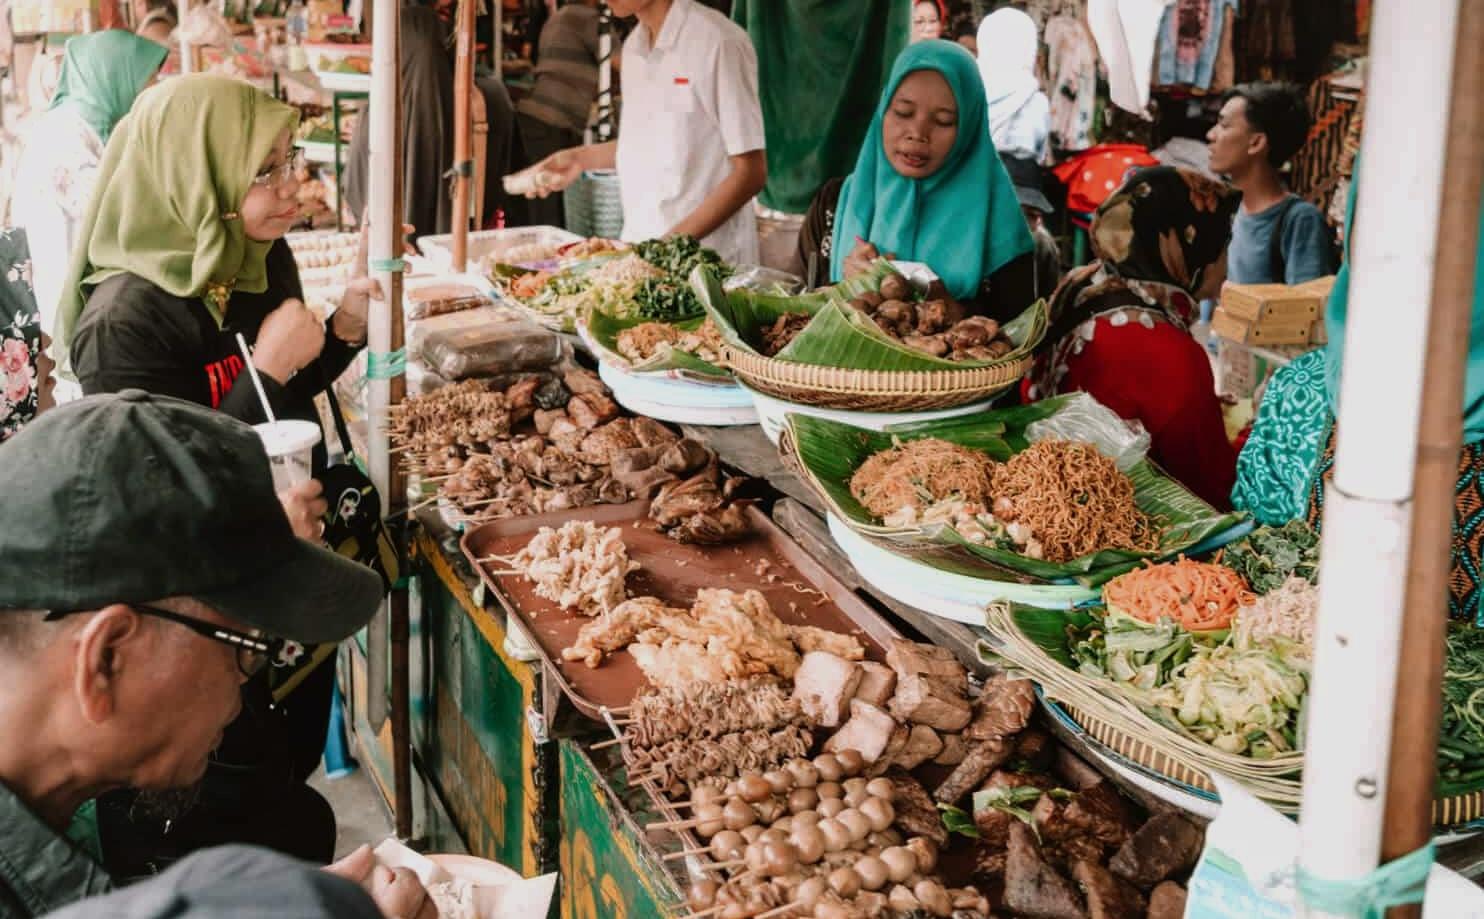 Makanan khas Jawa Timur (salt in our hair)